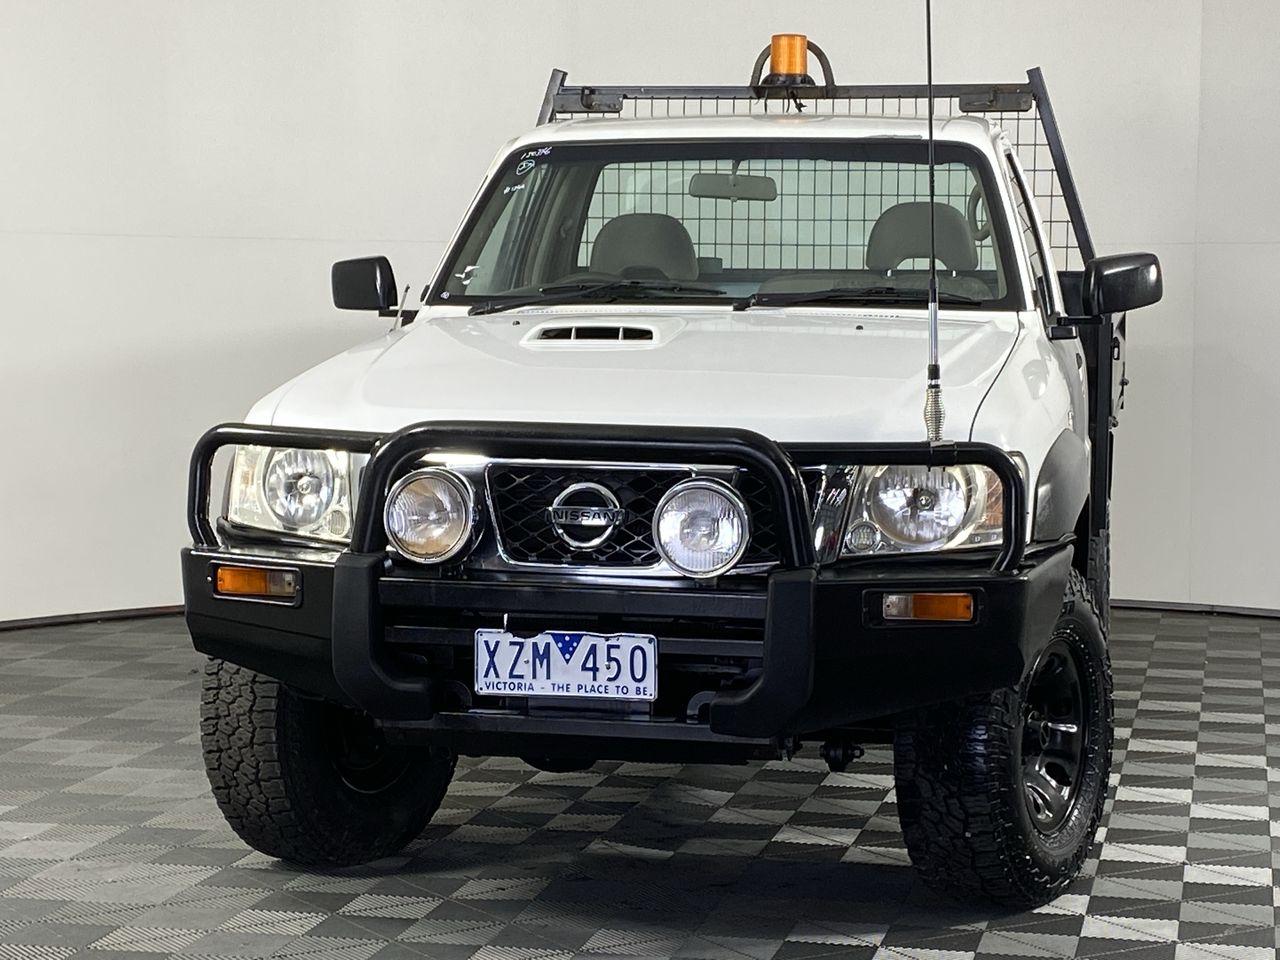 2010 Nissan Patrol DX (4x4) GU Turbo Diesel Manual Cab Chassis